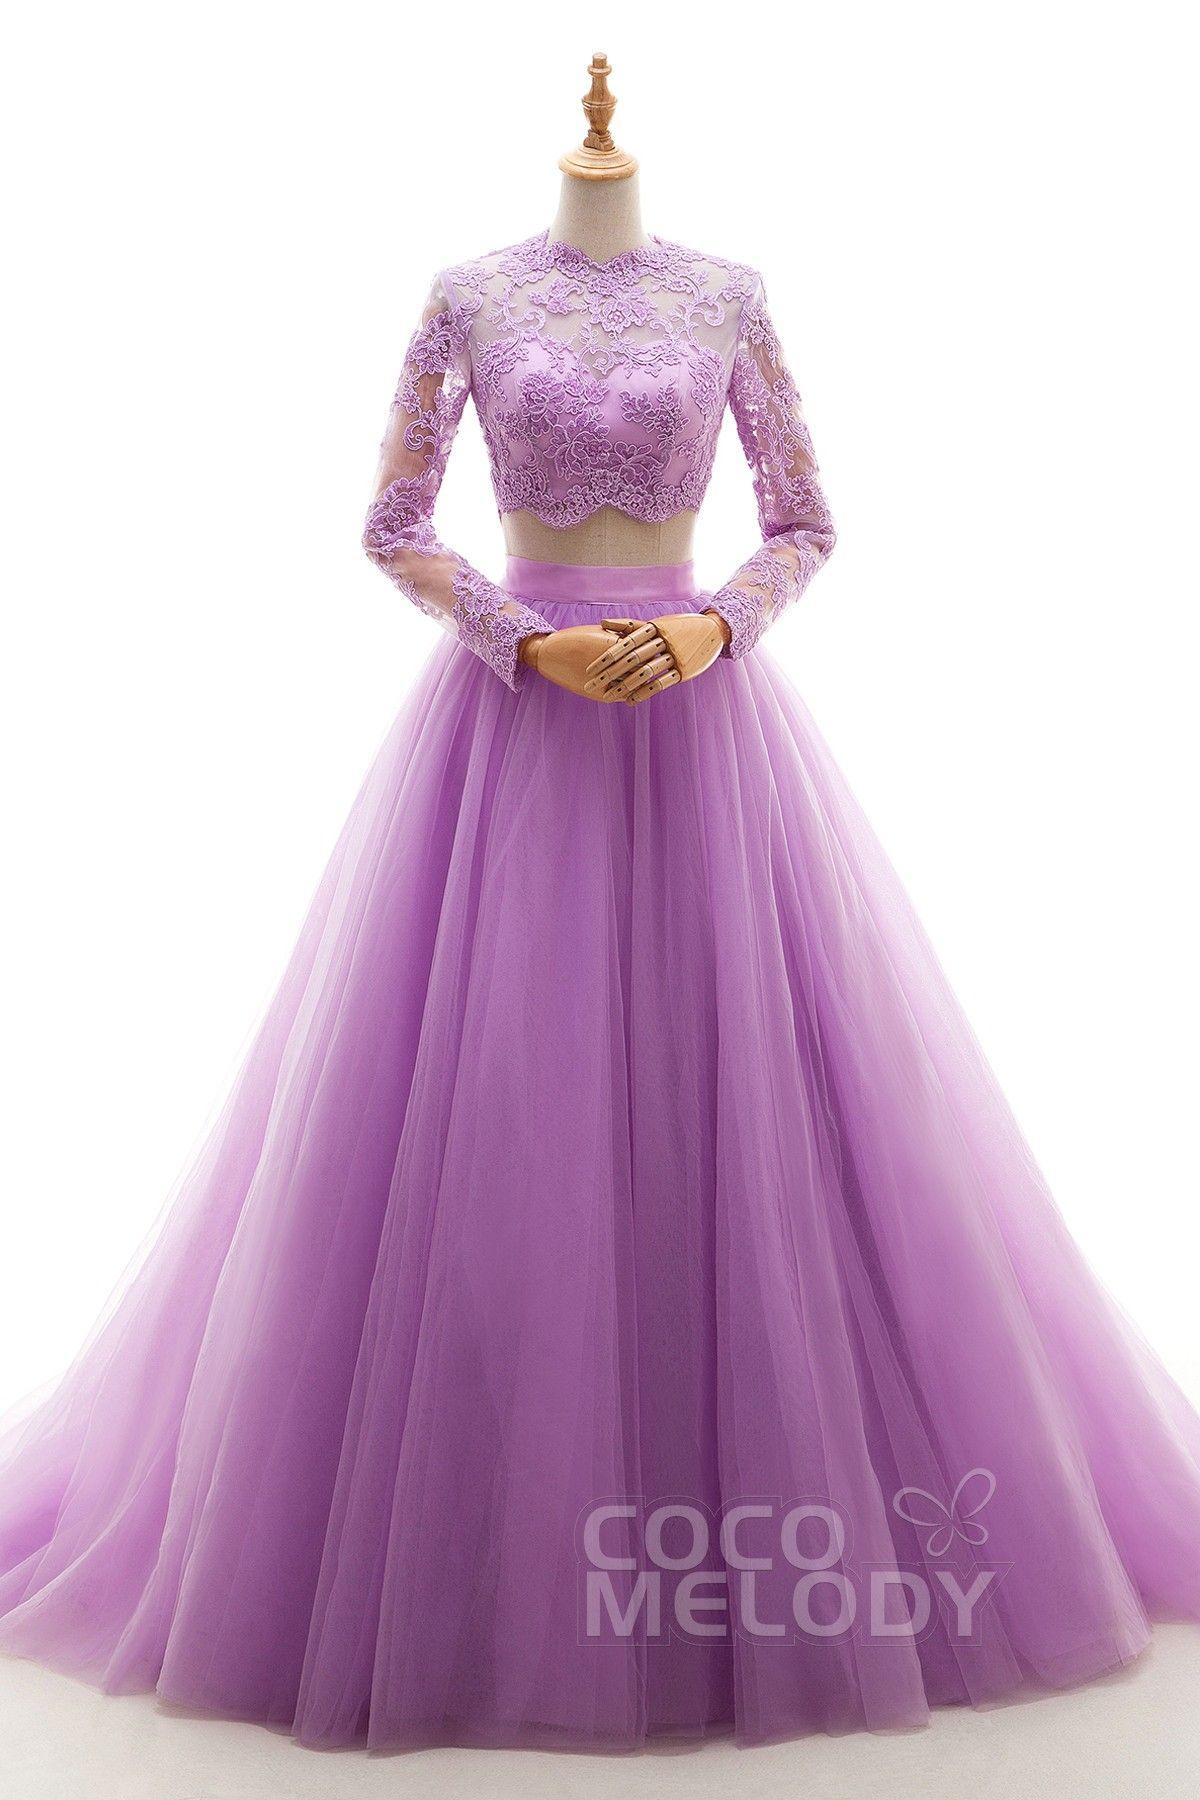 Usd 399 A Line Court Train Tulle Wedding Dress Ld3988 Quince Dresses Tulle Wedding Dress Quinceanera Dresses Blue [ 1800 x 1200 Pixel ]